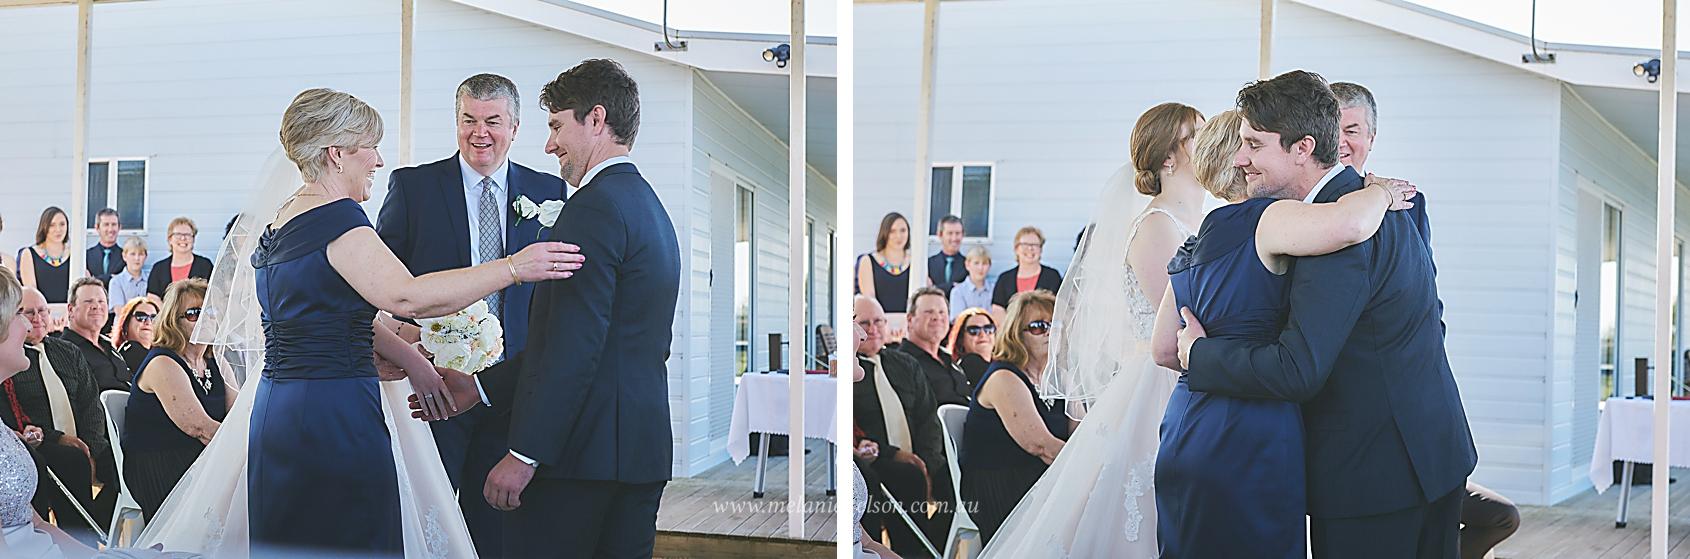 yorke_peninsula_wedding_photographer_0035.jpg